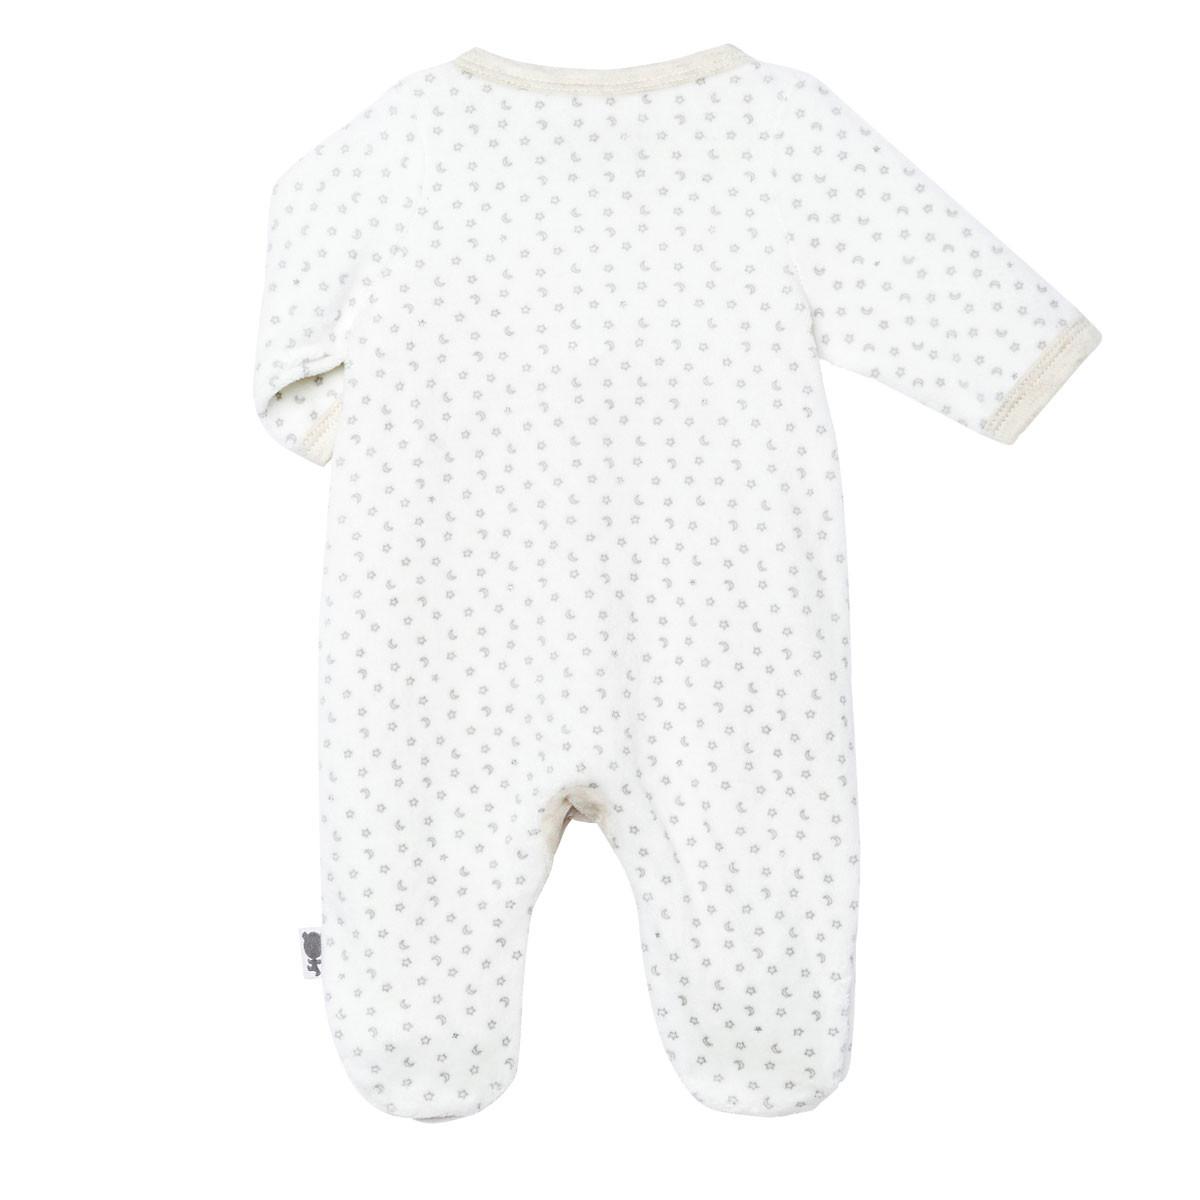 Pyjama bébé velours mixte Nuit Etoilée dos